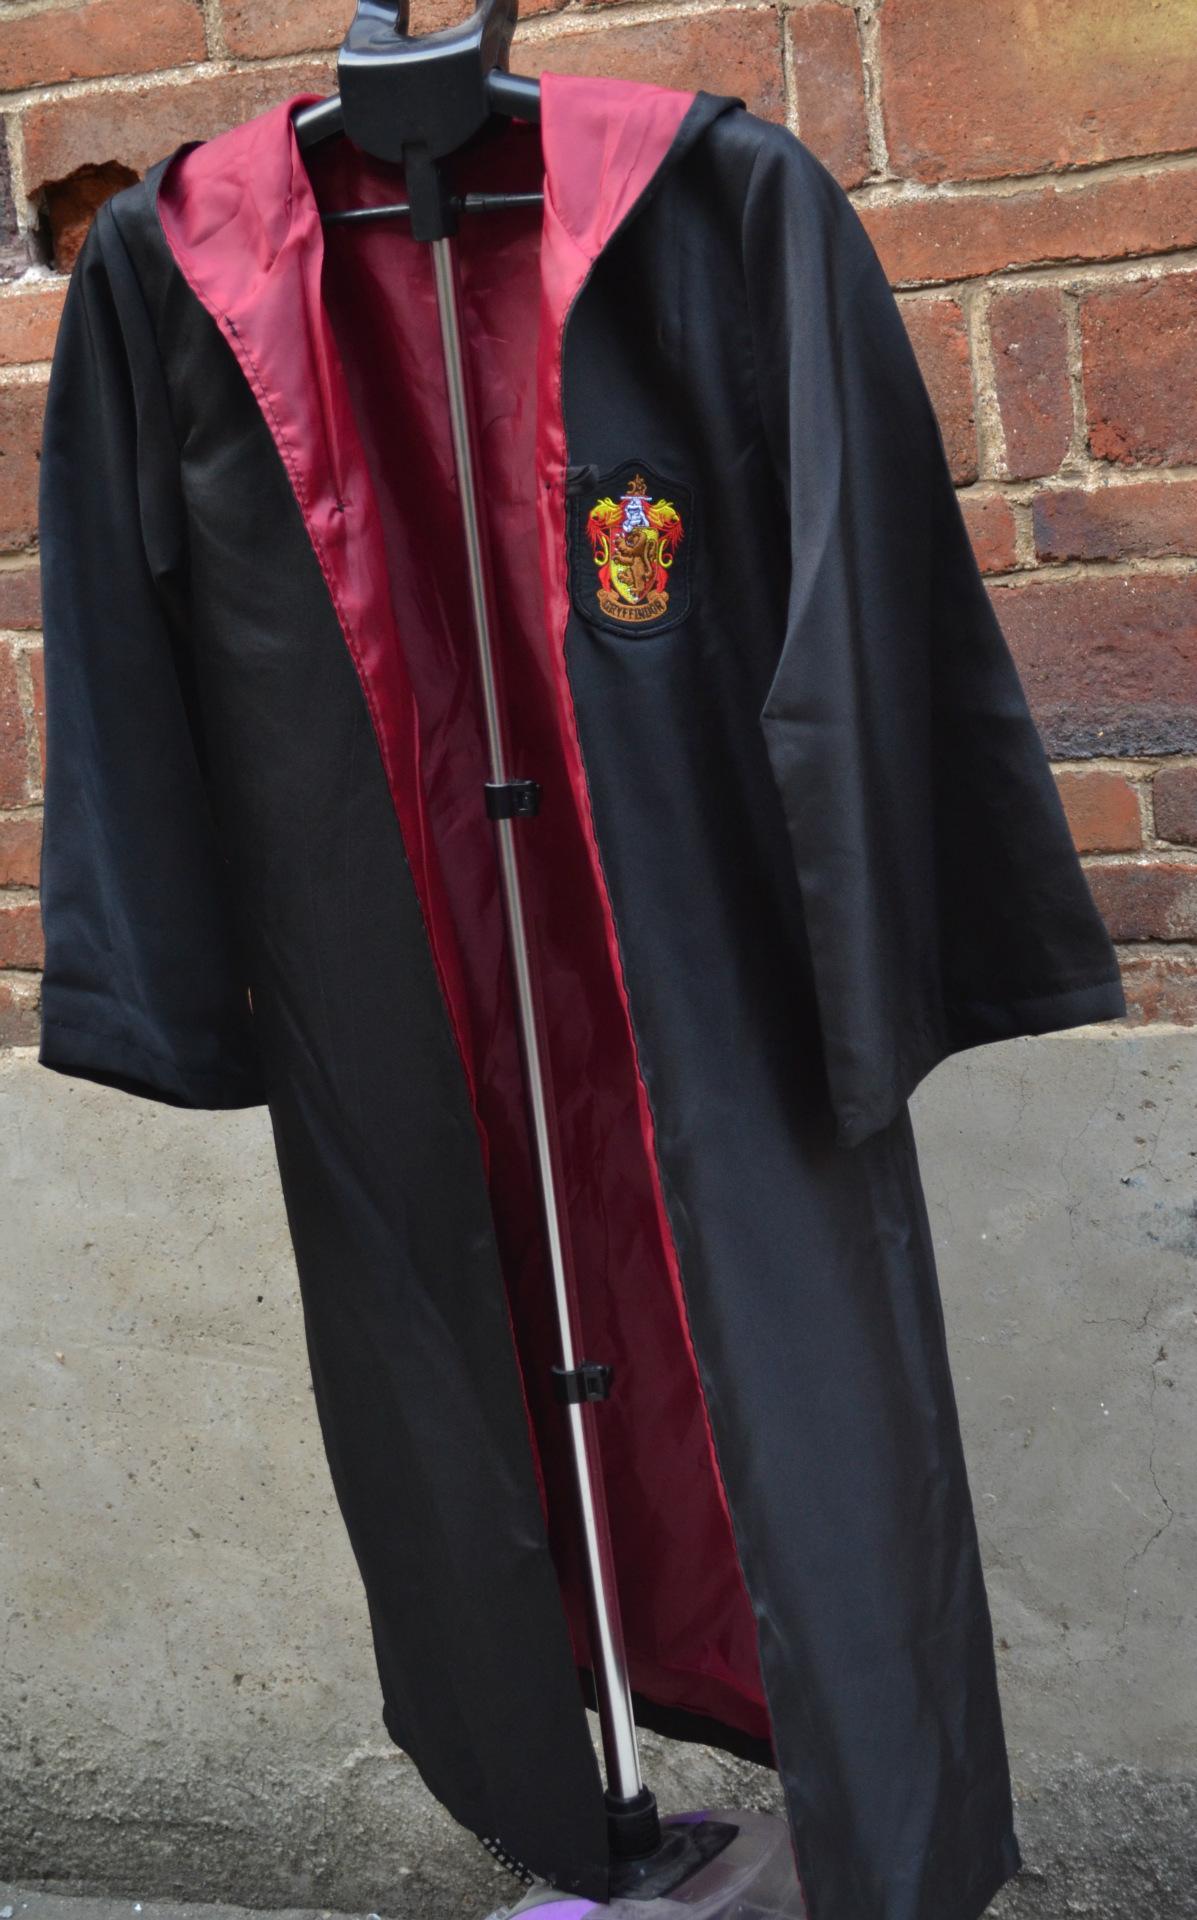 Compare Harry Potter Cosplay Clothing Harry Children Kids *d*lt Magic Gowns Cloak Picture Color Cos Uniforms Clothing *d*lt Models Szie M155 165Cm Intl Prices